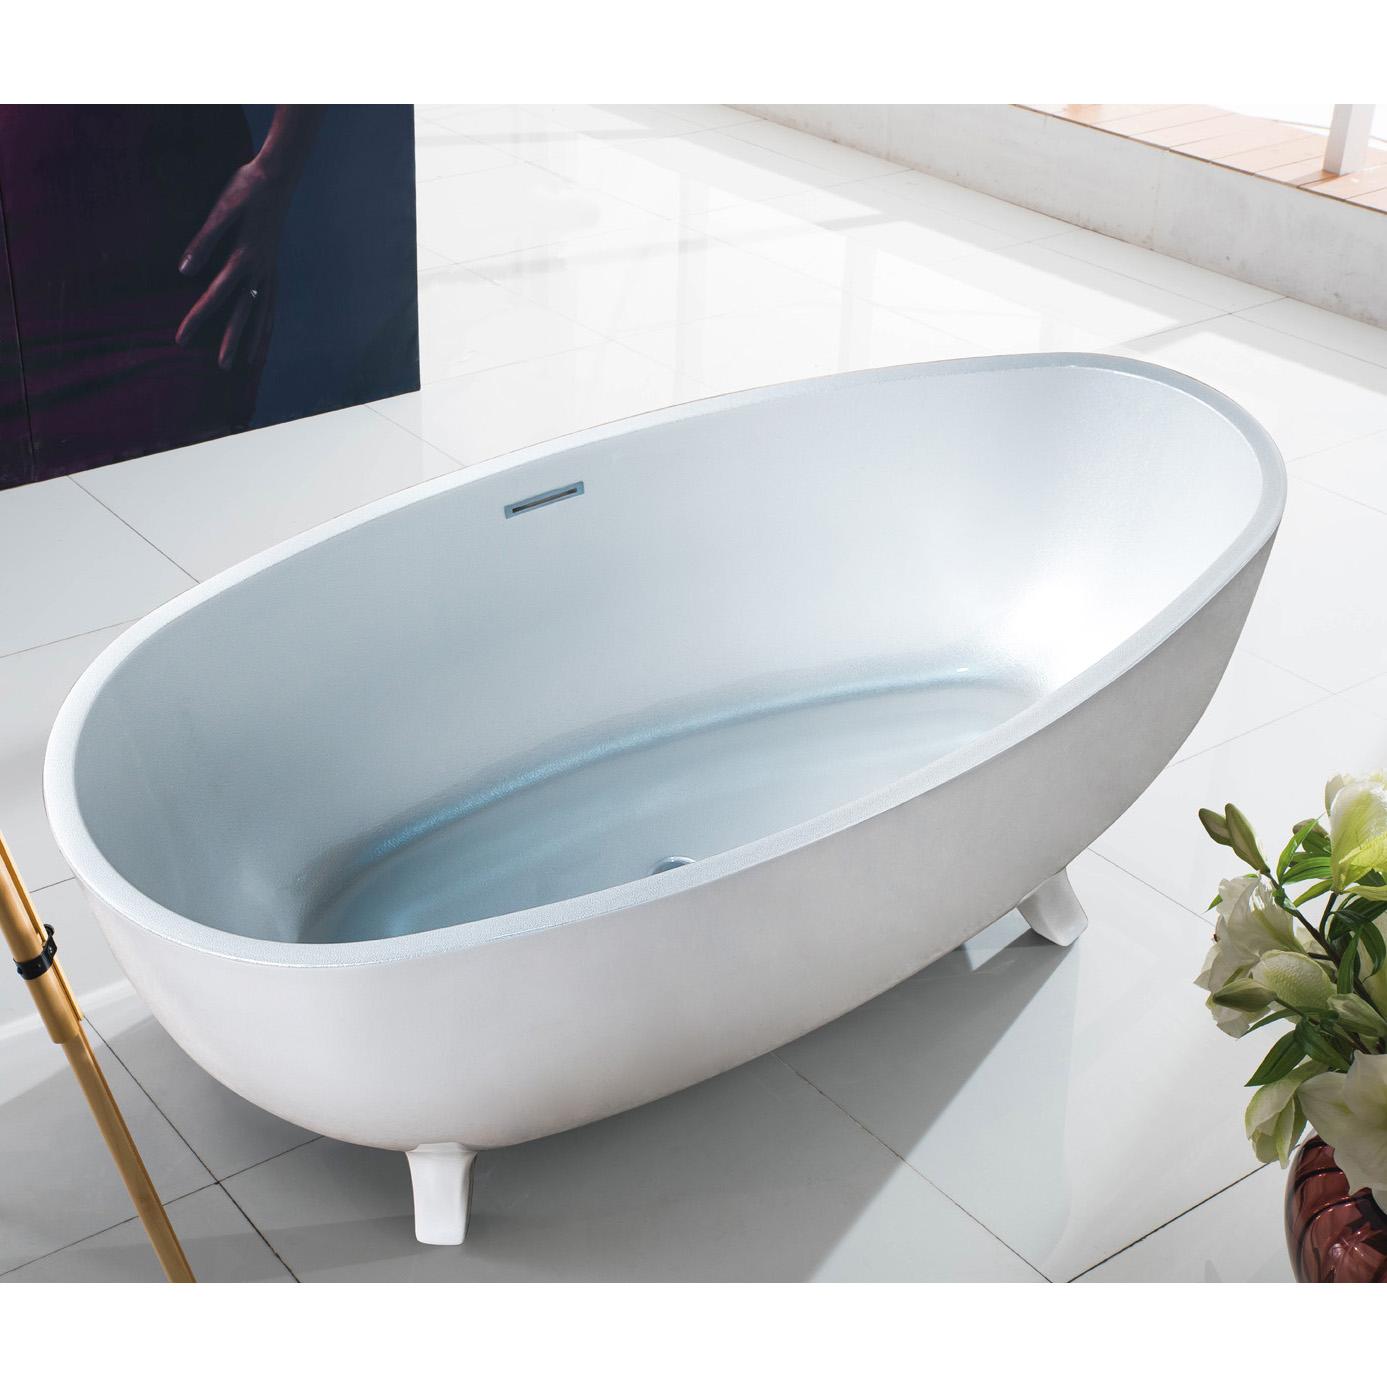 Акриловая ванна Belbagno BB42-1700-Perl акриловая ванна belbagno bb40 1700 marine 170x80